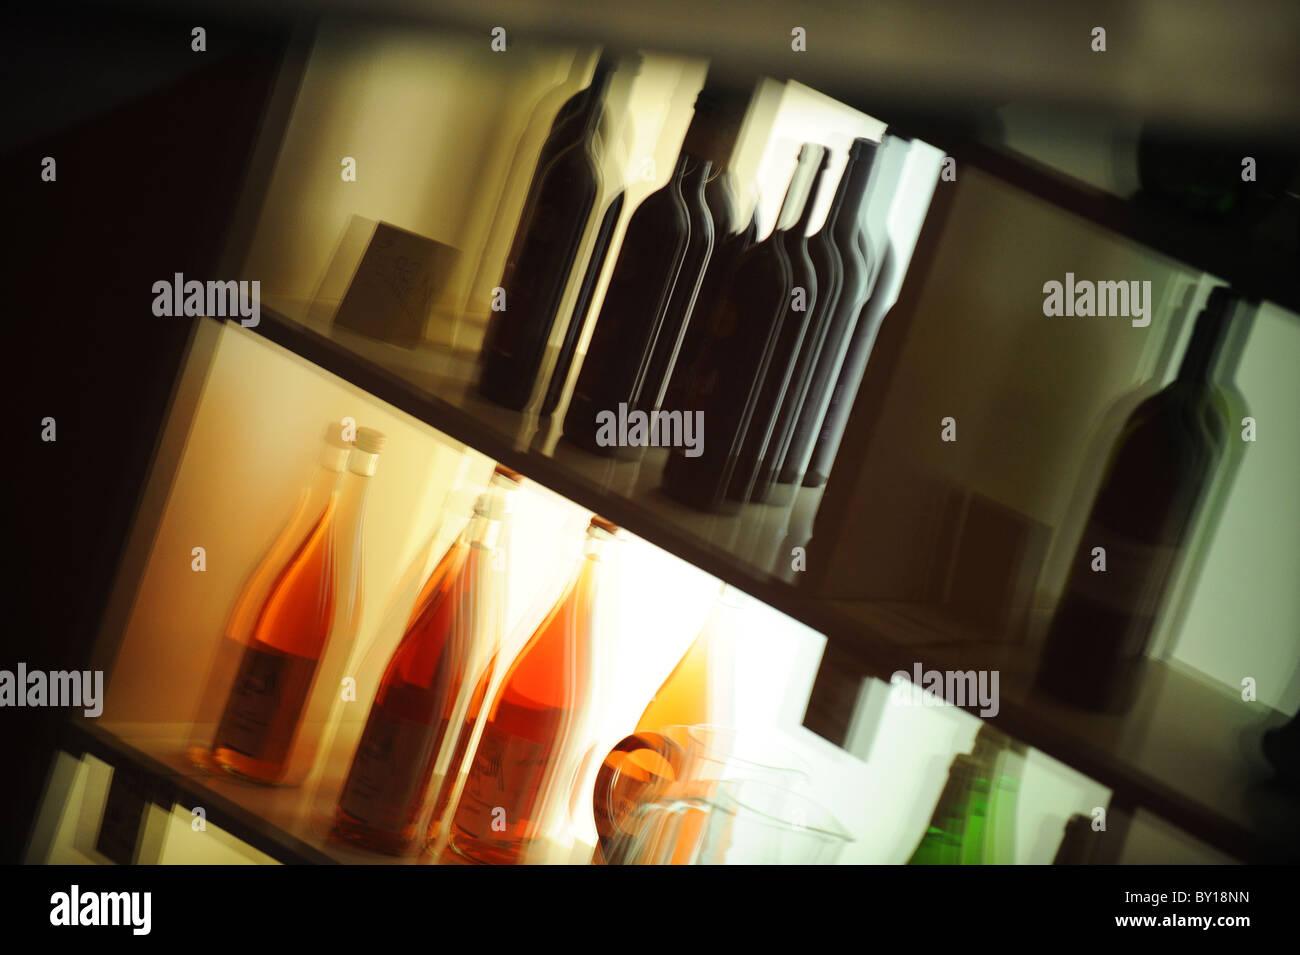 Bottles on a shelf - Stock Image